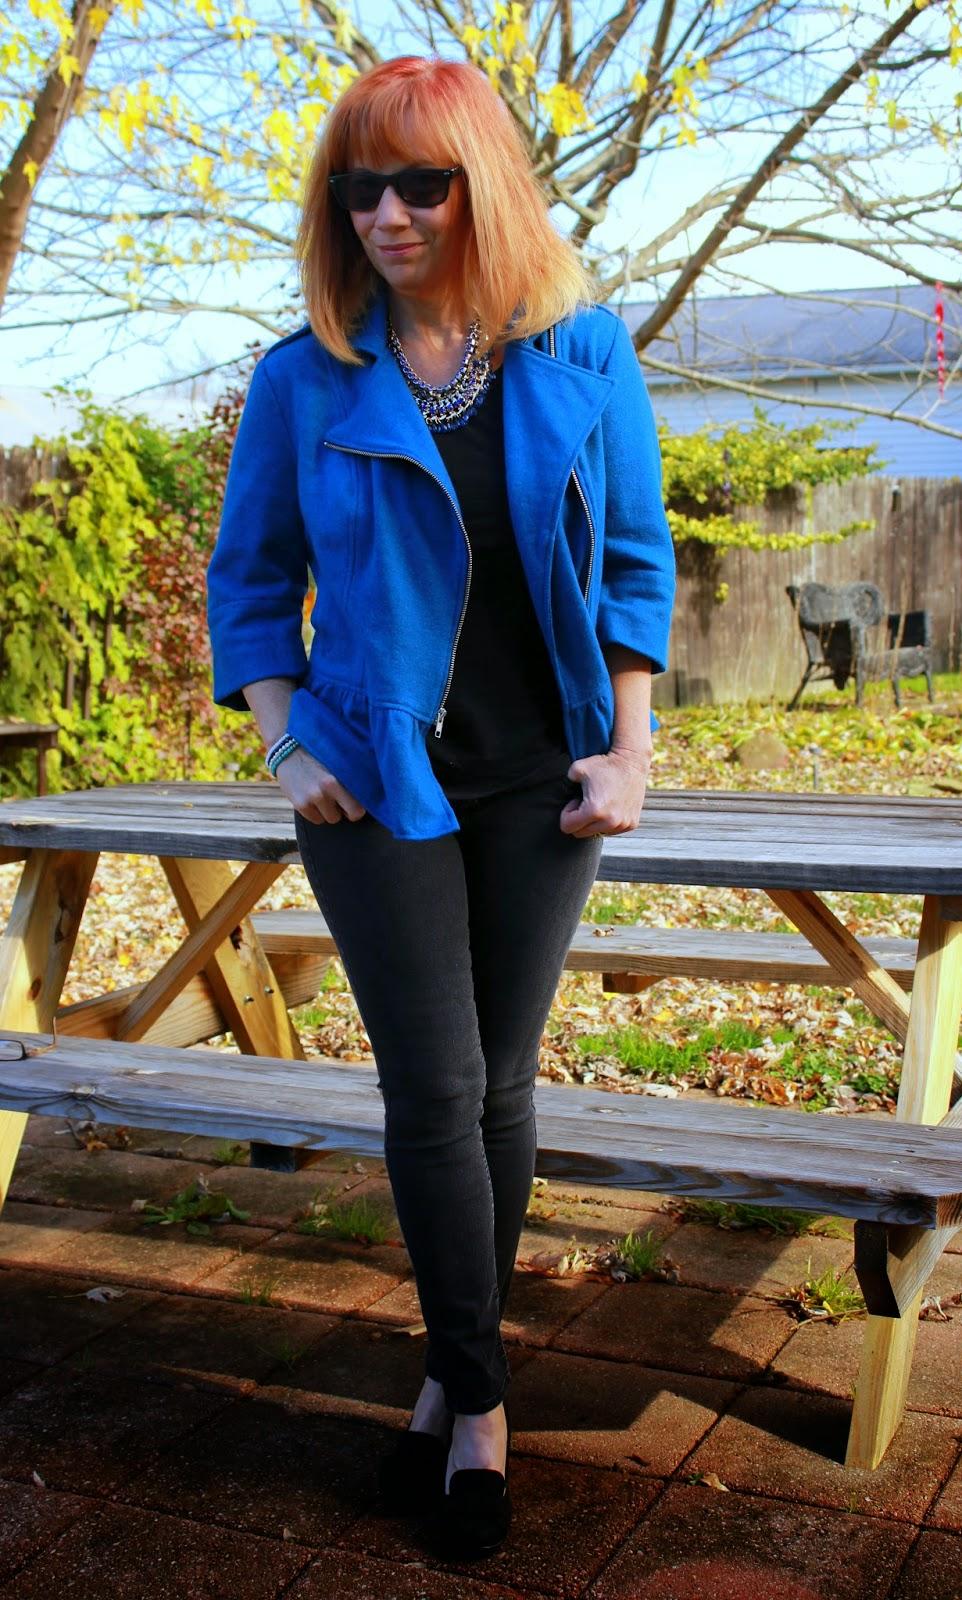 eShakti Collaboration: Blue Peplum Moto Jacket, Black Skinny Jeans And Black Pumps